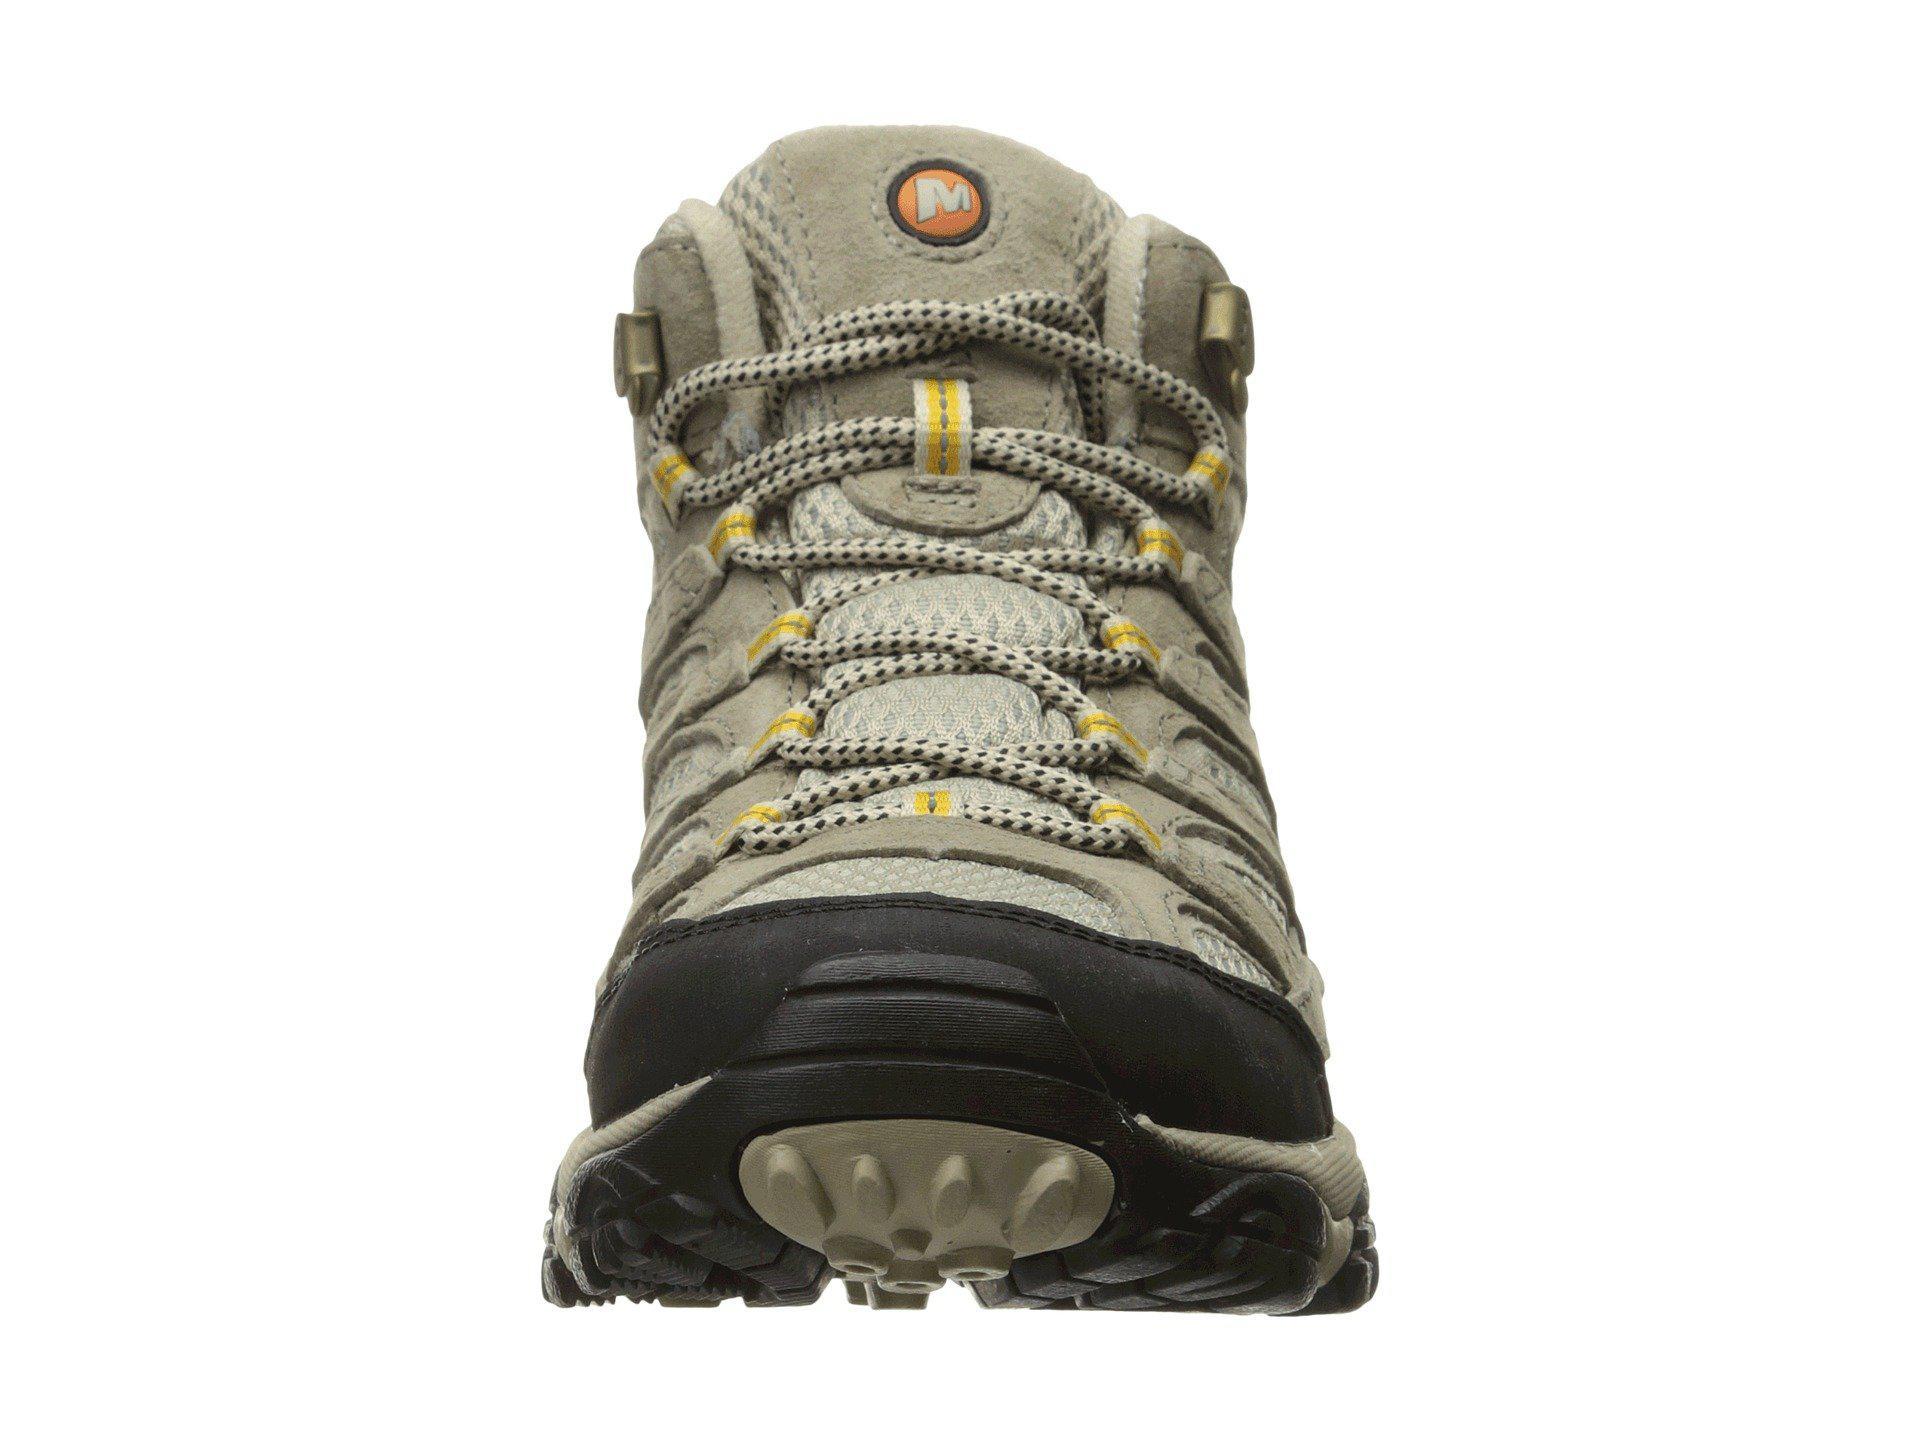 c18b687ca74 Merrell - Multicolor Moab 2 Vent Mid (bracken purple) Women s Shoes for  Men. View fullscreen